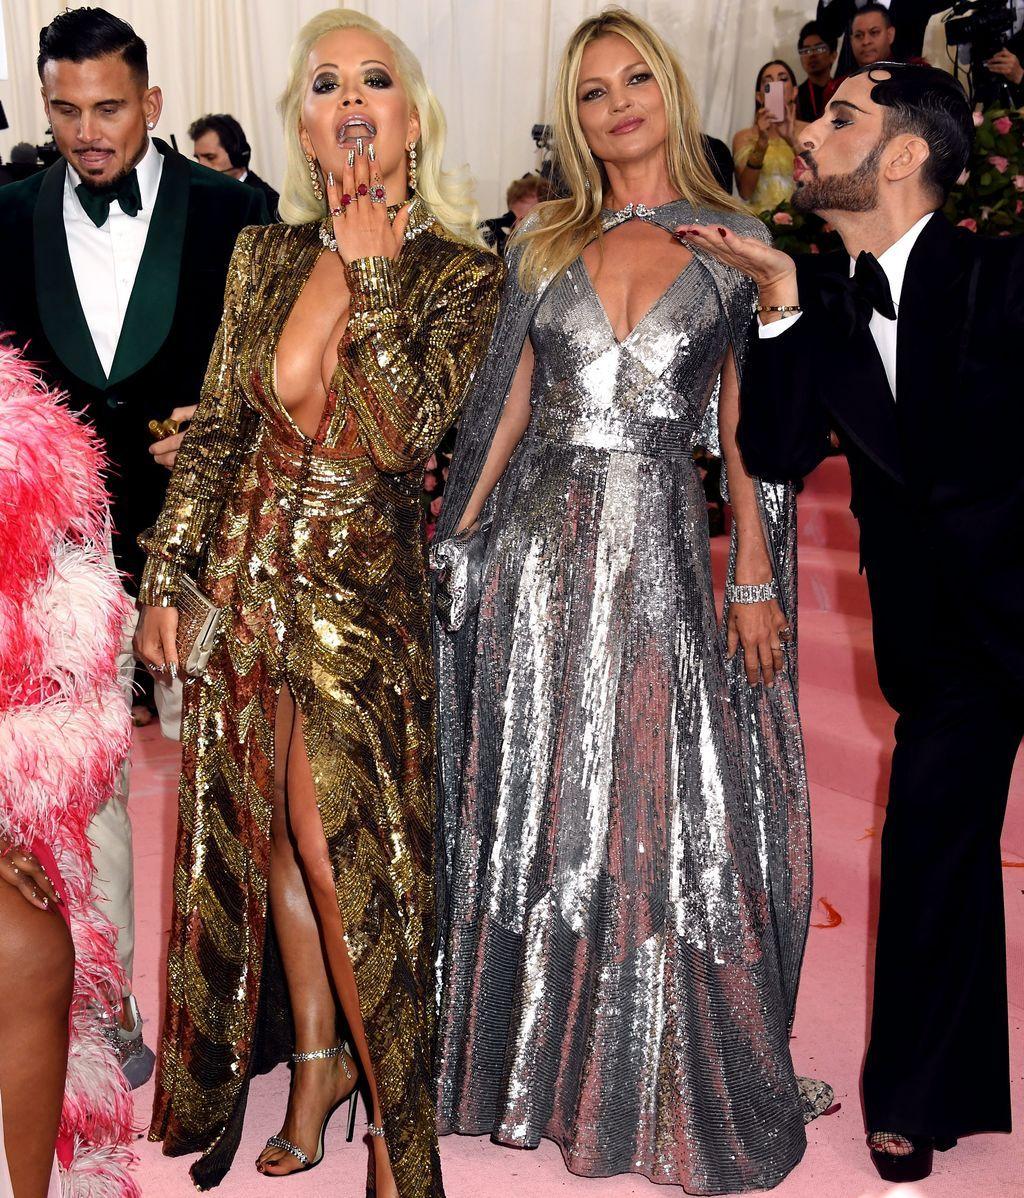 Rita Ora y Kate Moss con vestidos de lentejuelas de Marc Jacobs